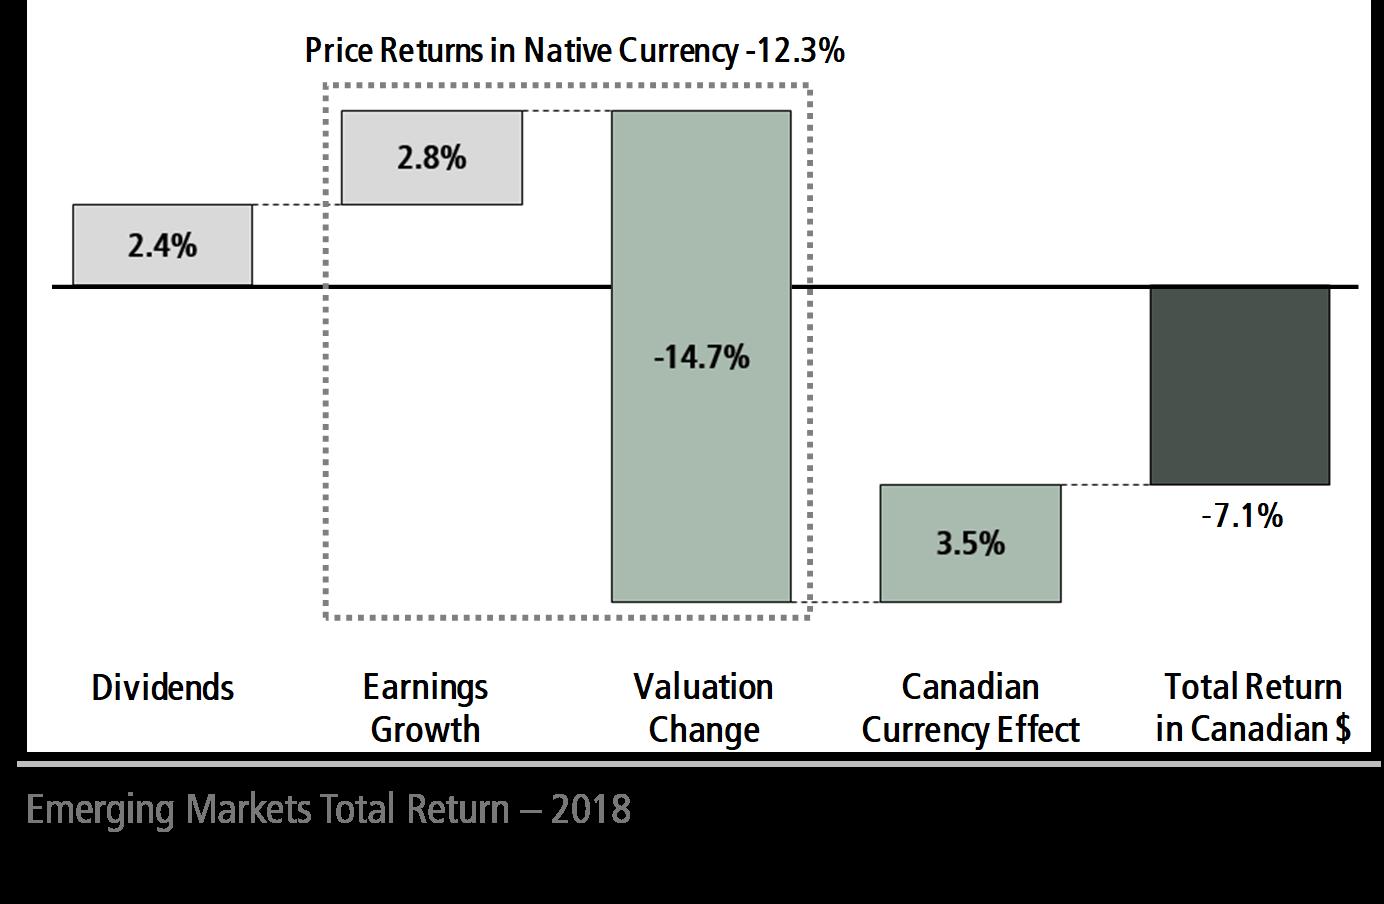 Emerging Markets Total Return - 2018